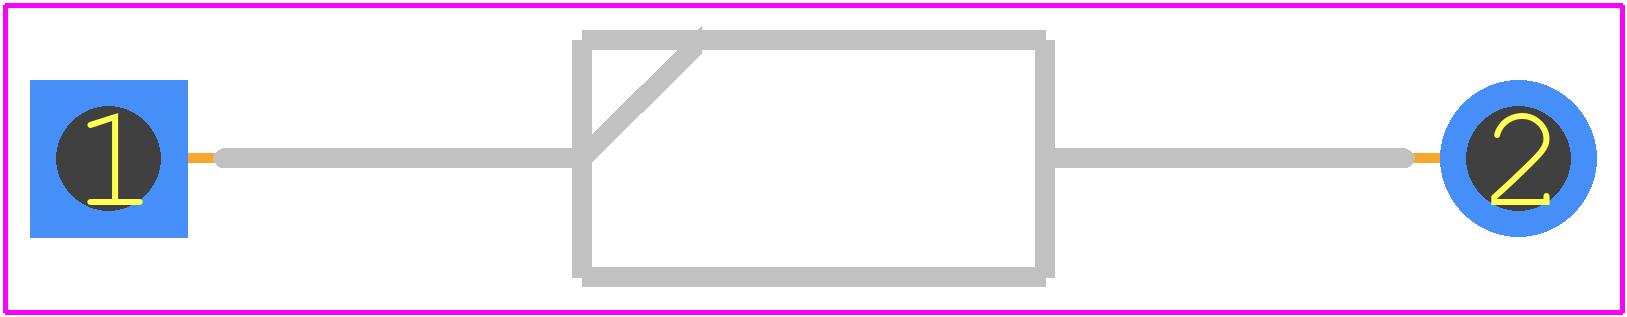 1N4002 - Fairchild Semiconductor PCB footprint - Diodes, Axial Diameter Horizontal Mounting - DO41A